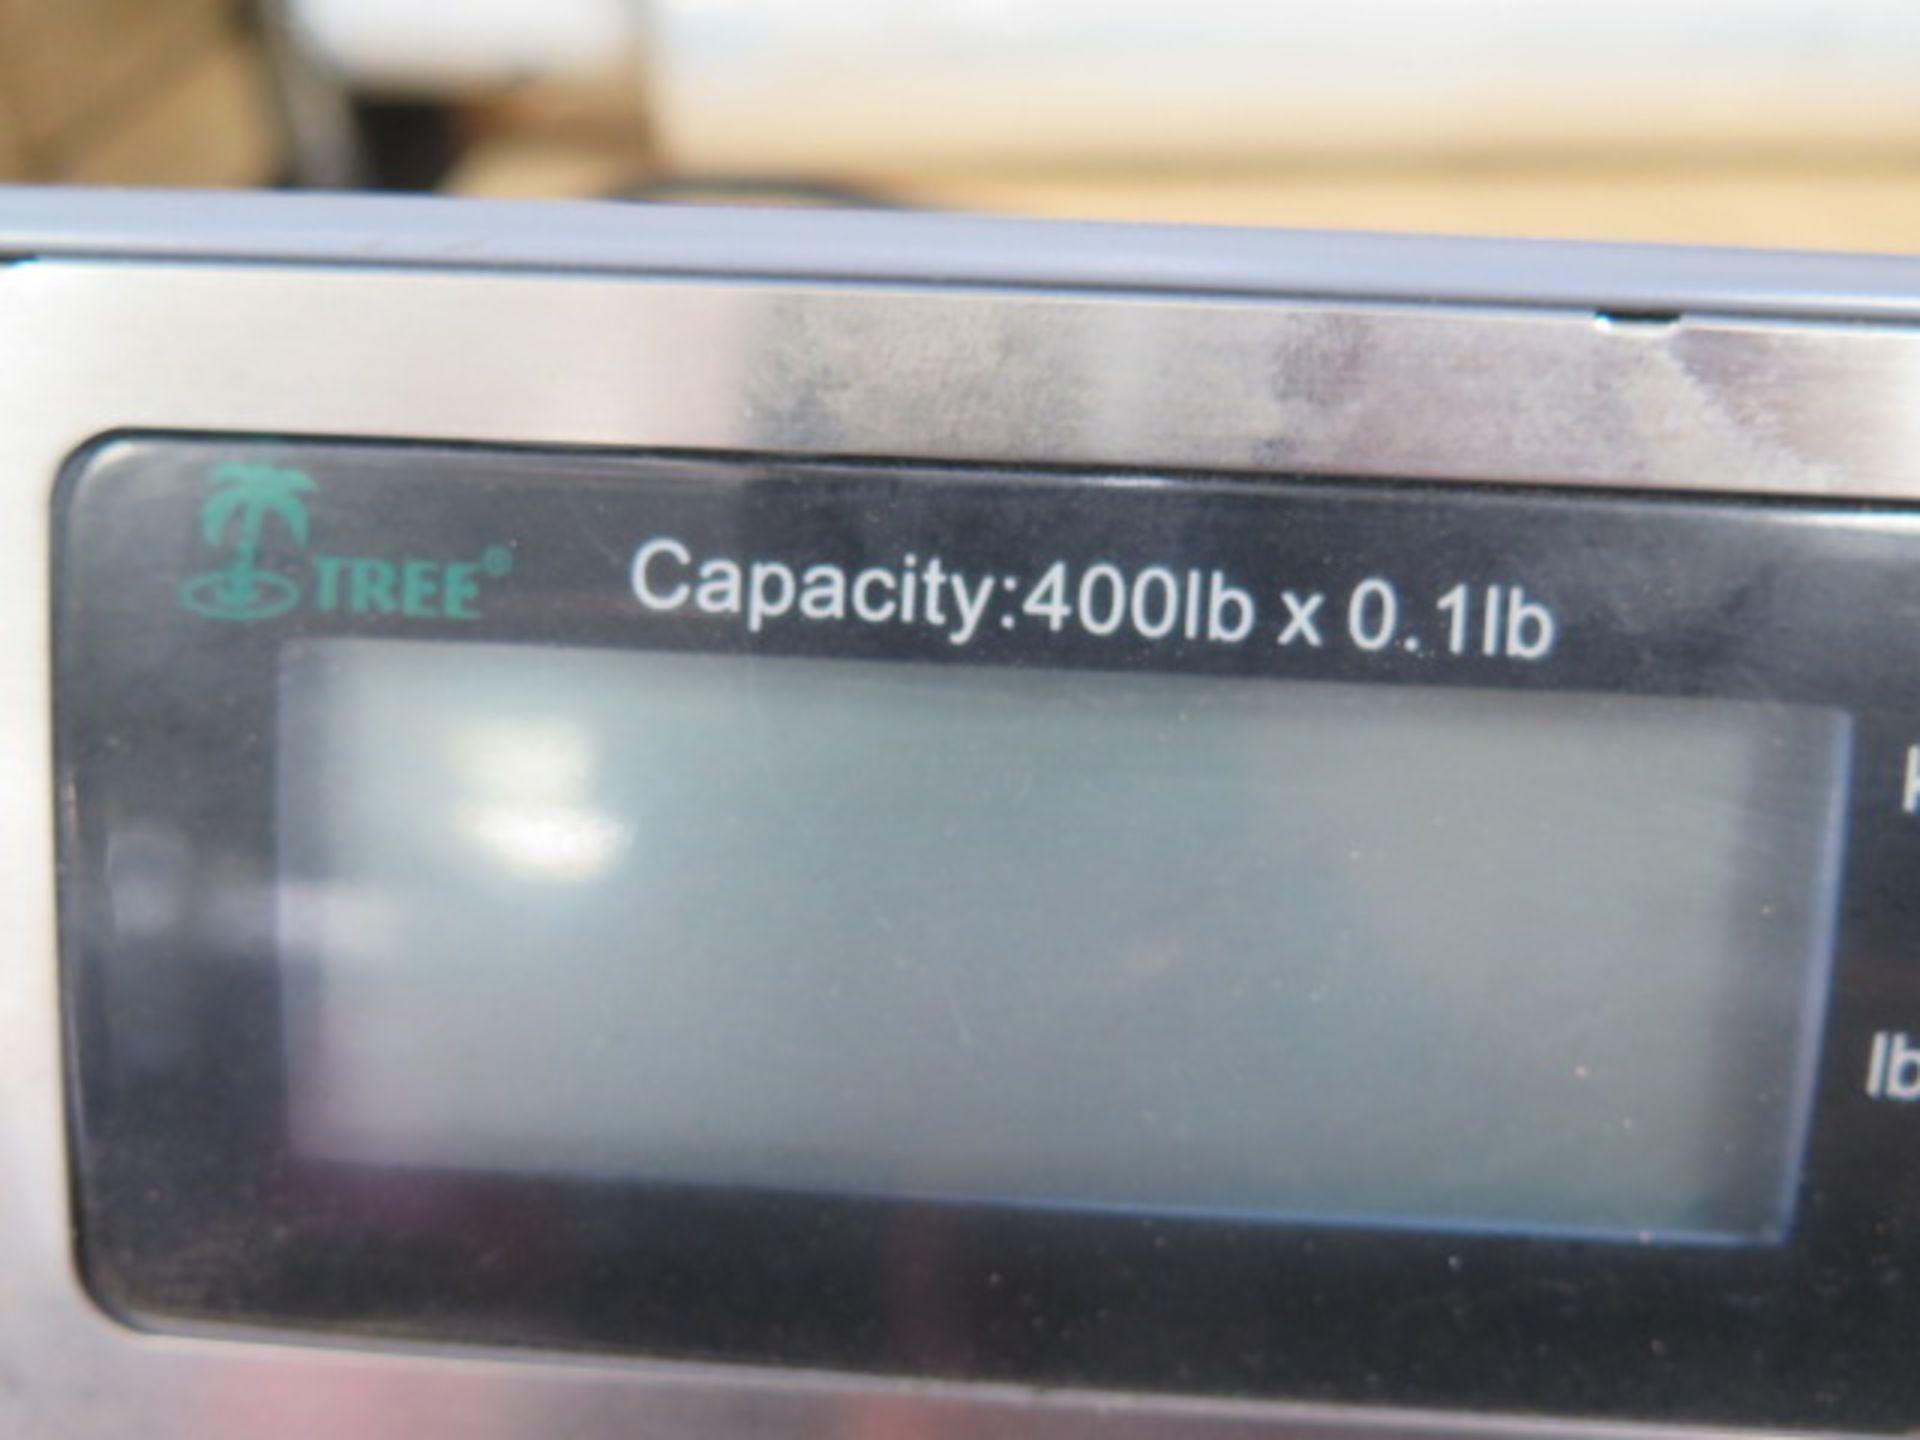 Tree 400 Lb Cap Digital Scale (SOLD AS-IS - NO WARRANTY) - Image 3 of 3